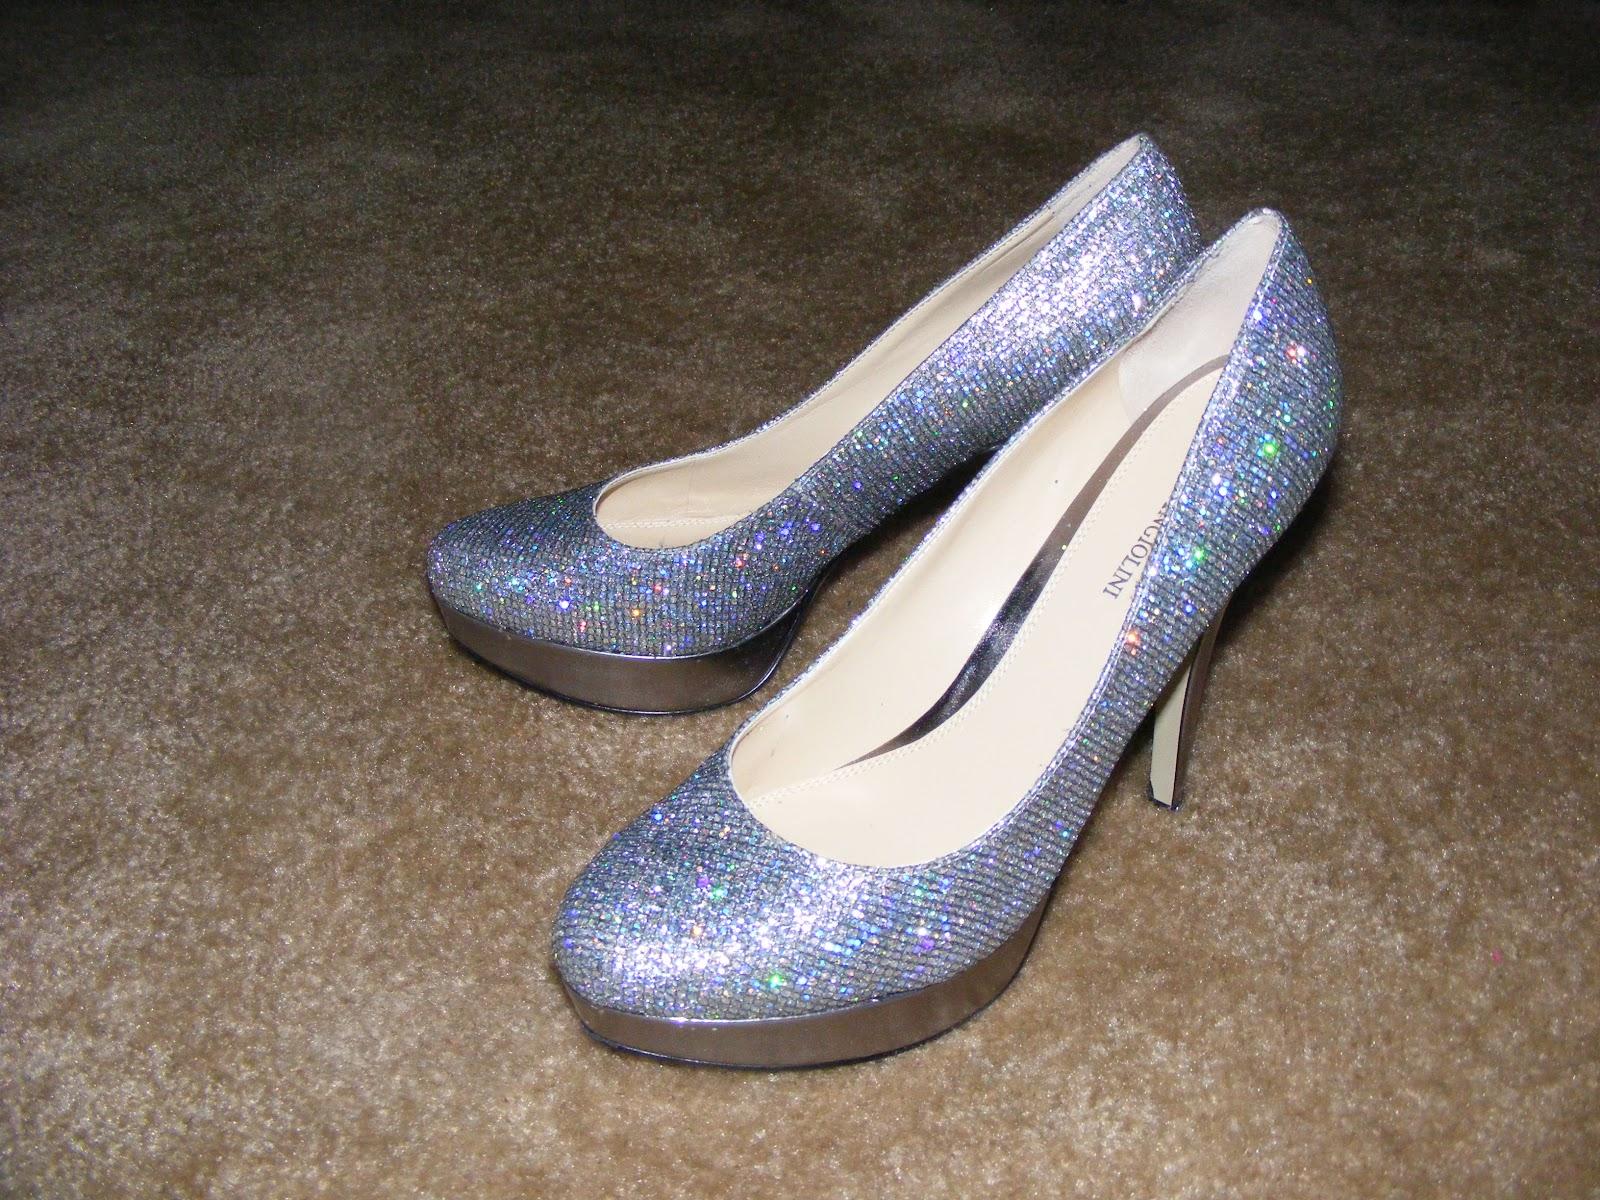 Dsw Shoes Sales Associate Salary